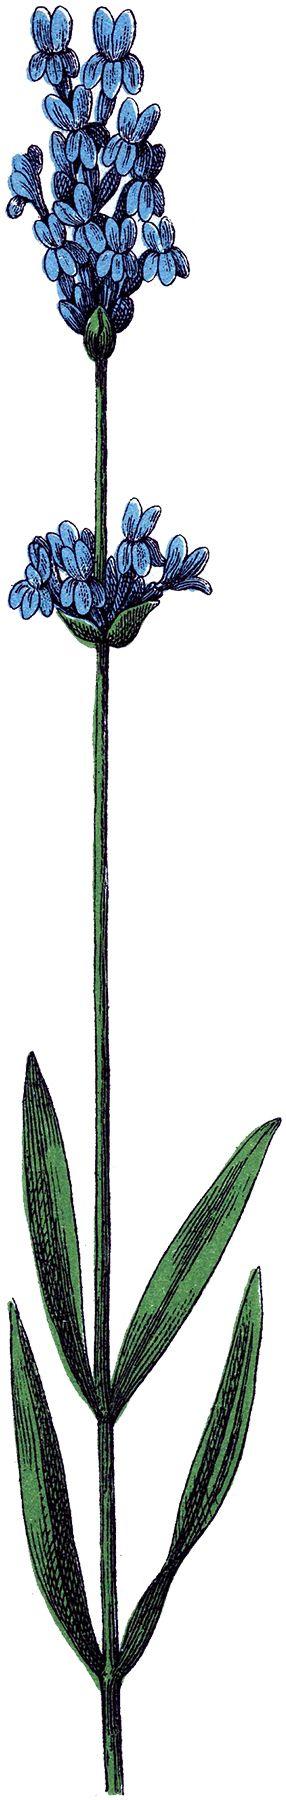 286x1800 Lavender Flower Clip Art Lavanda